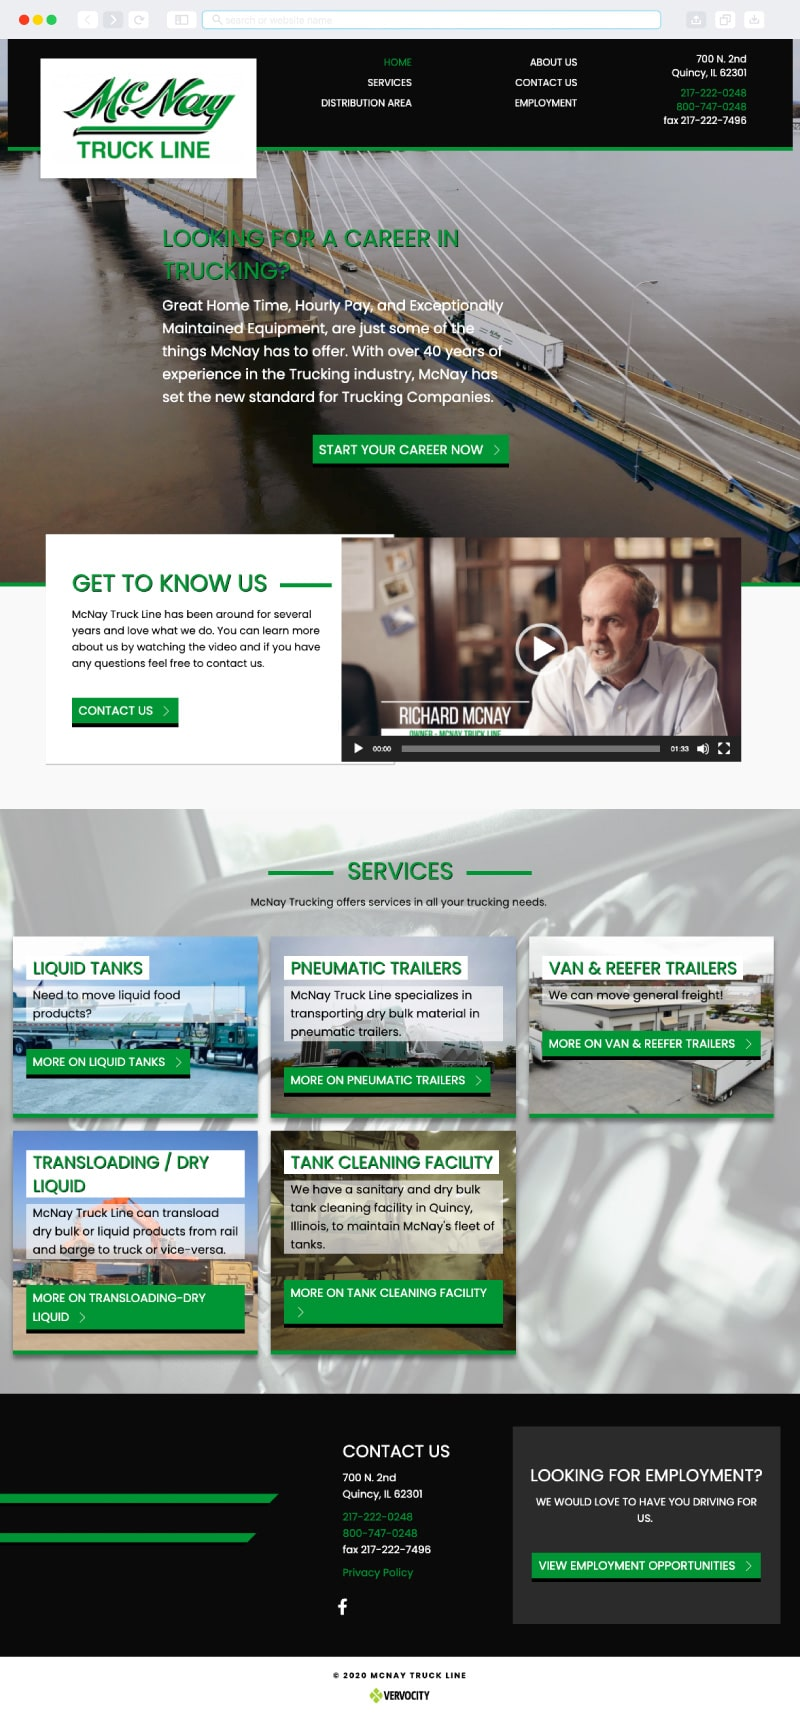 McNay Truck Line Homepage   Vervocity